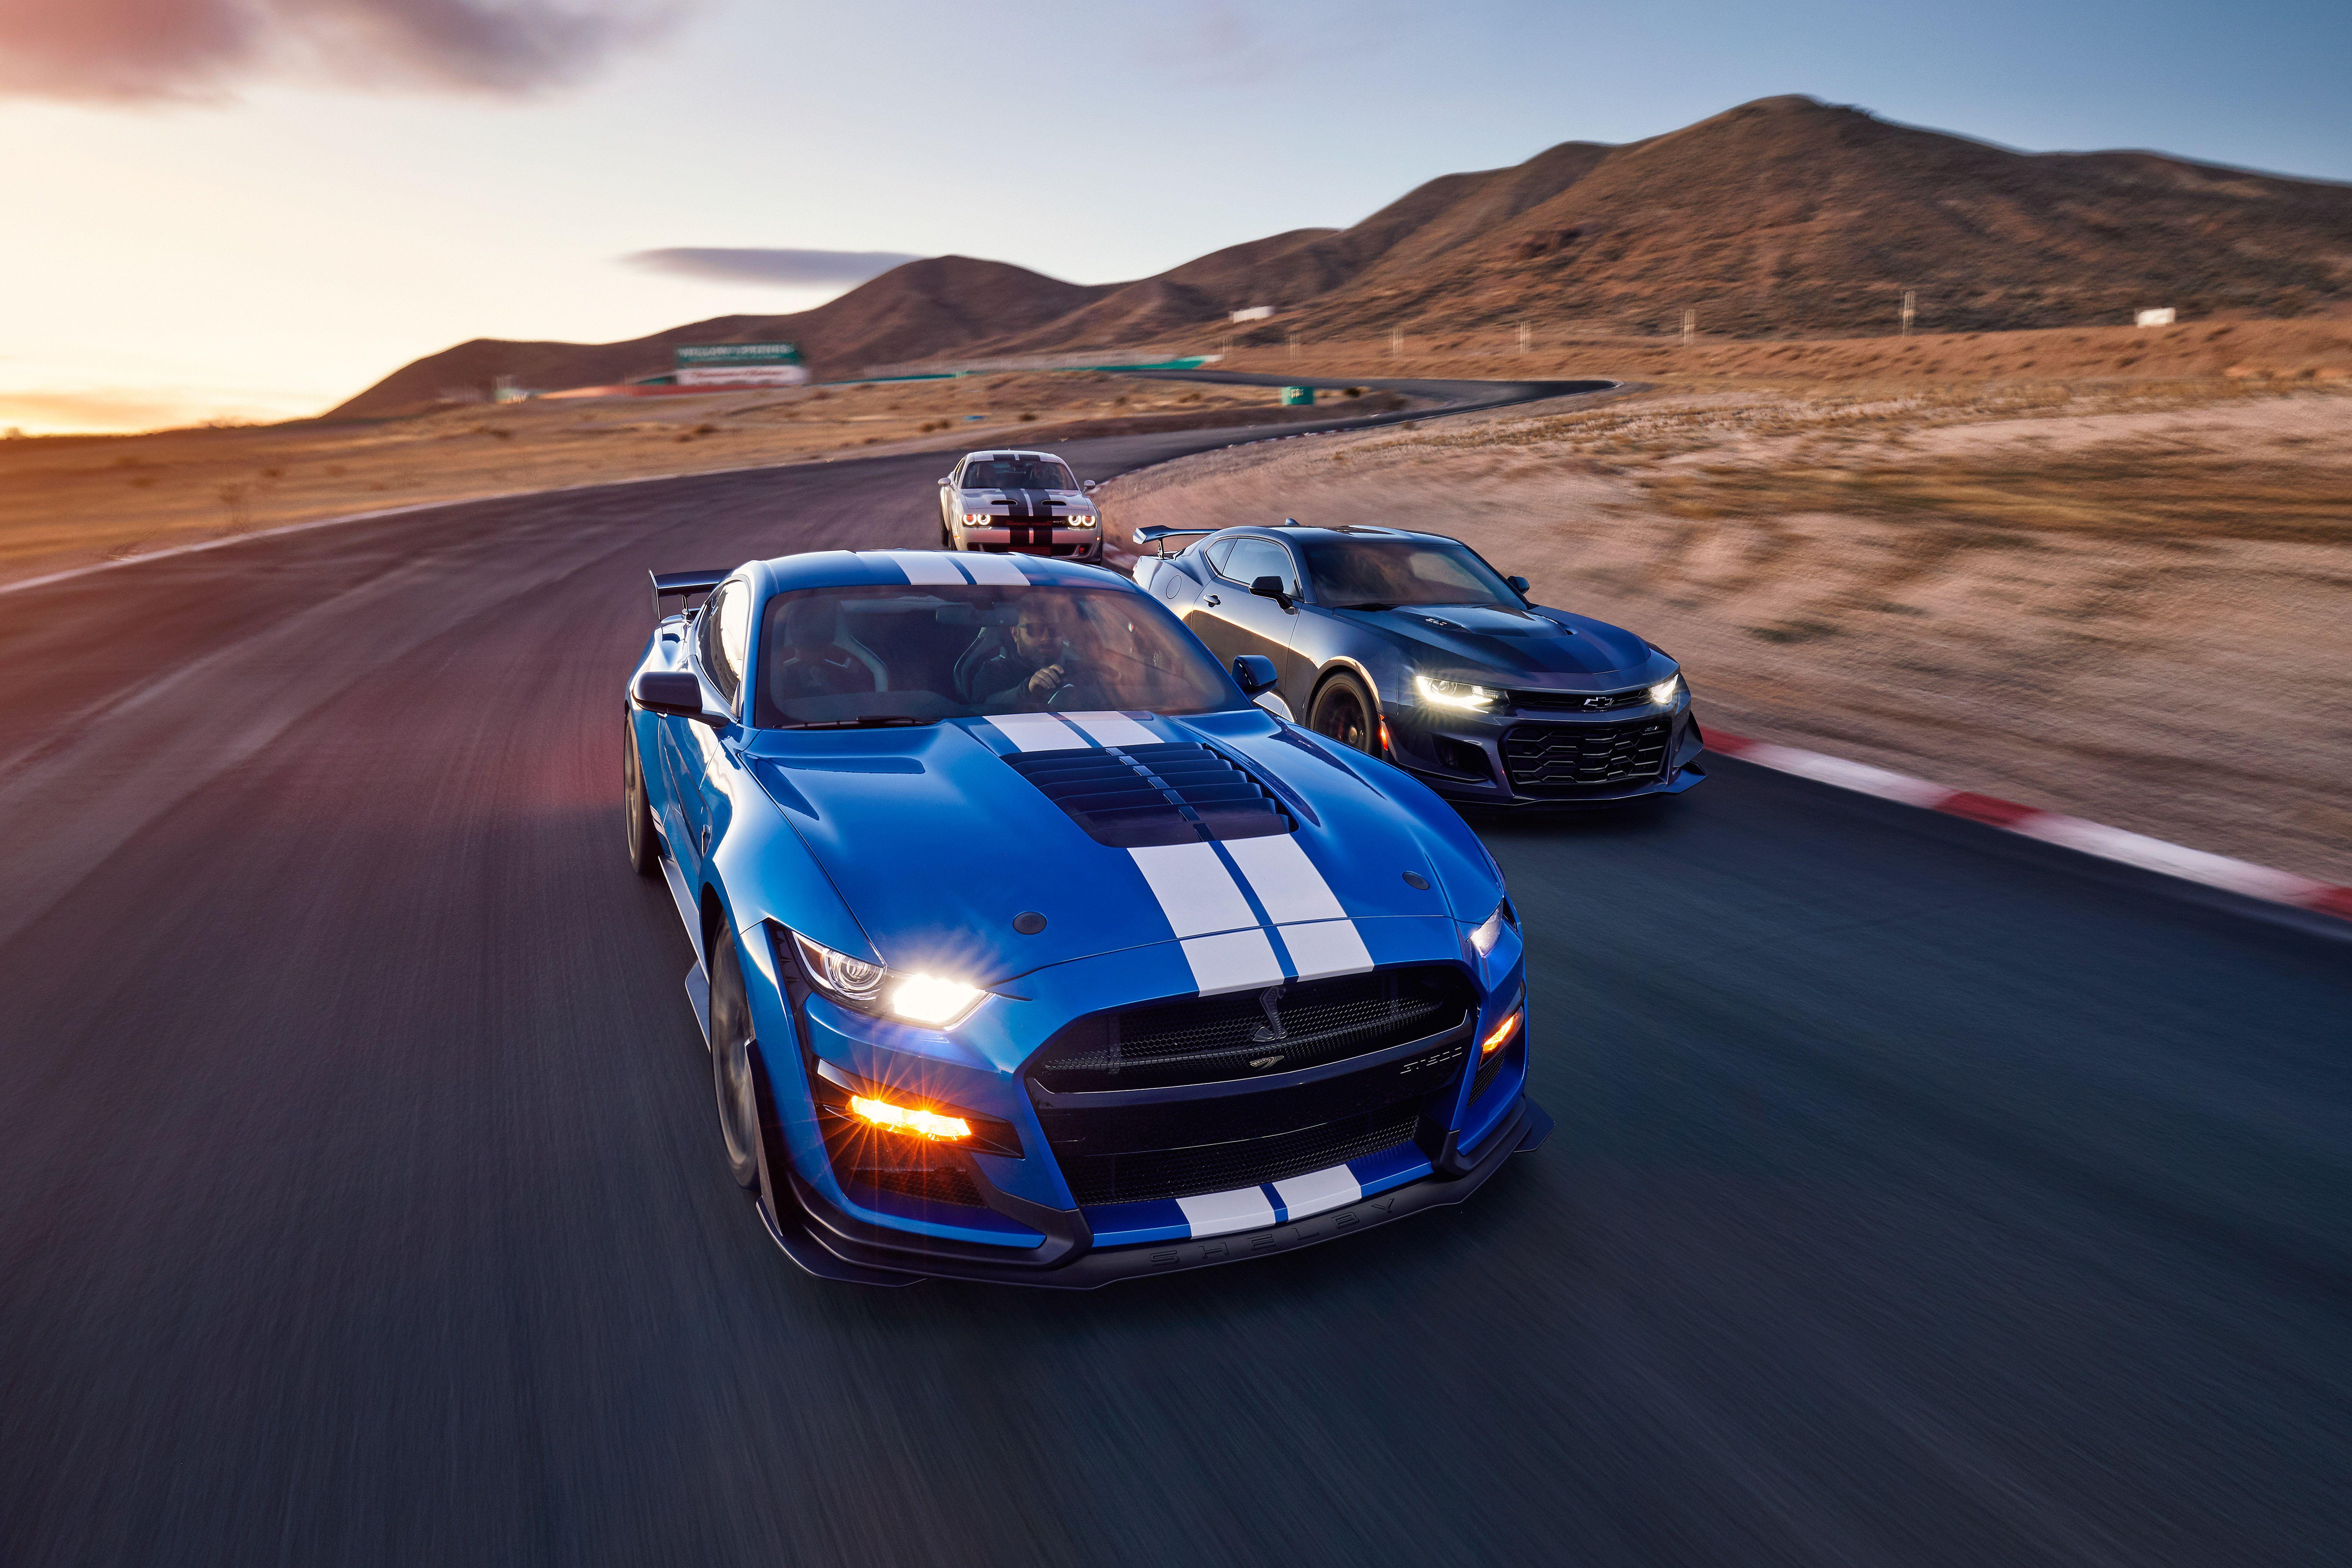 dodge challenger hellcat redeye vs camaro zl1 Comments on: Mustang Shelby GT500 vs. Camaro ZL1 1LE vs